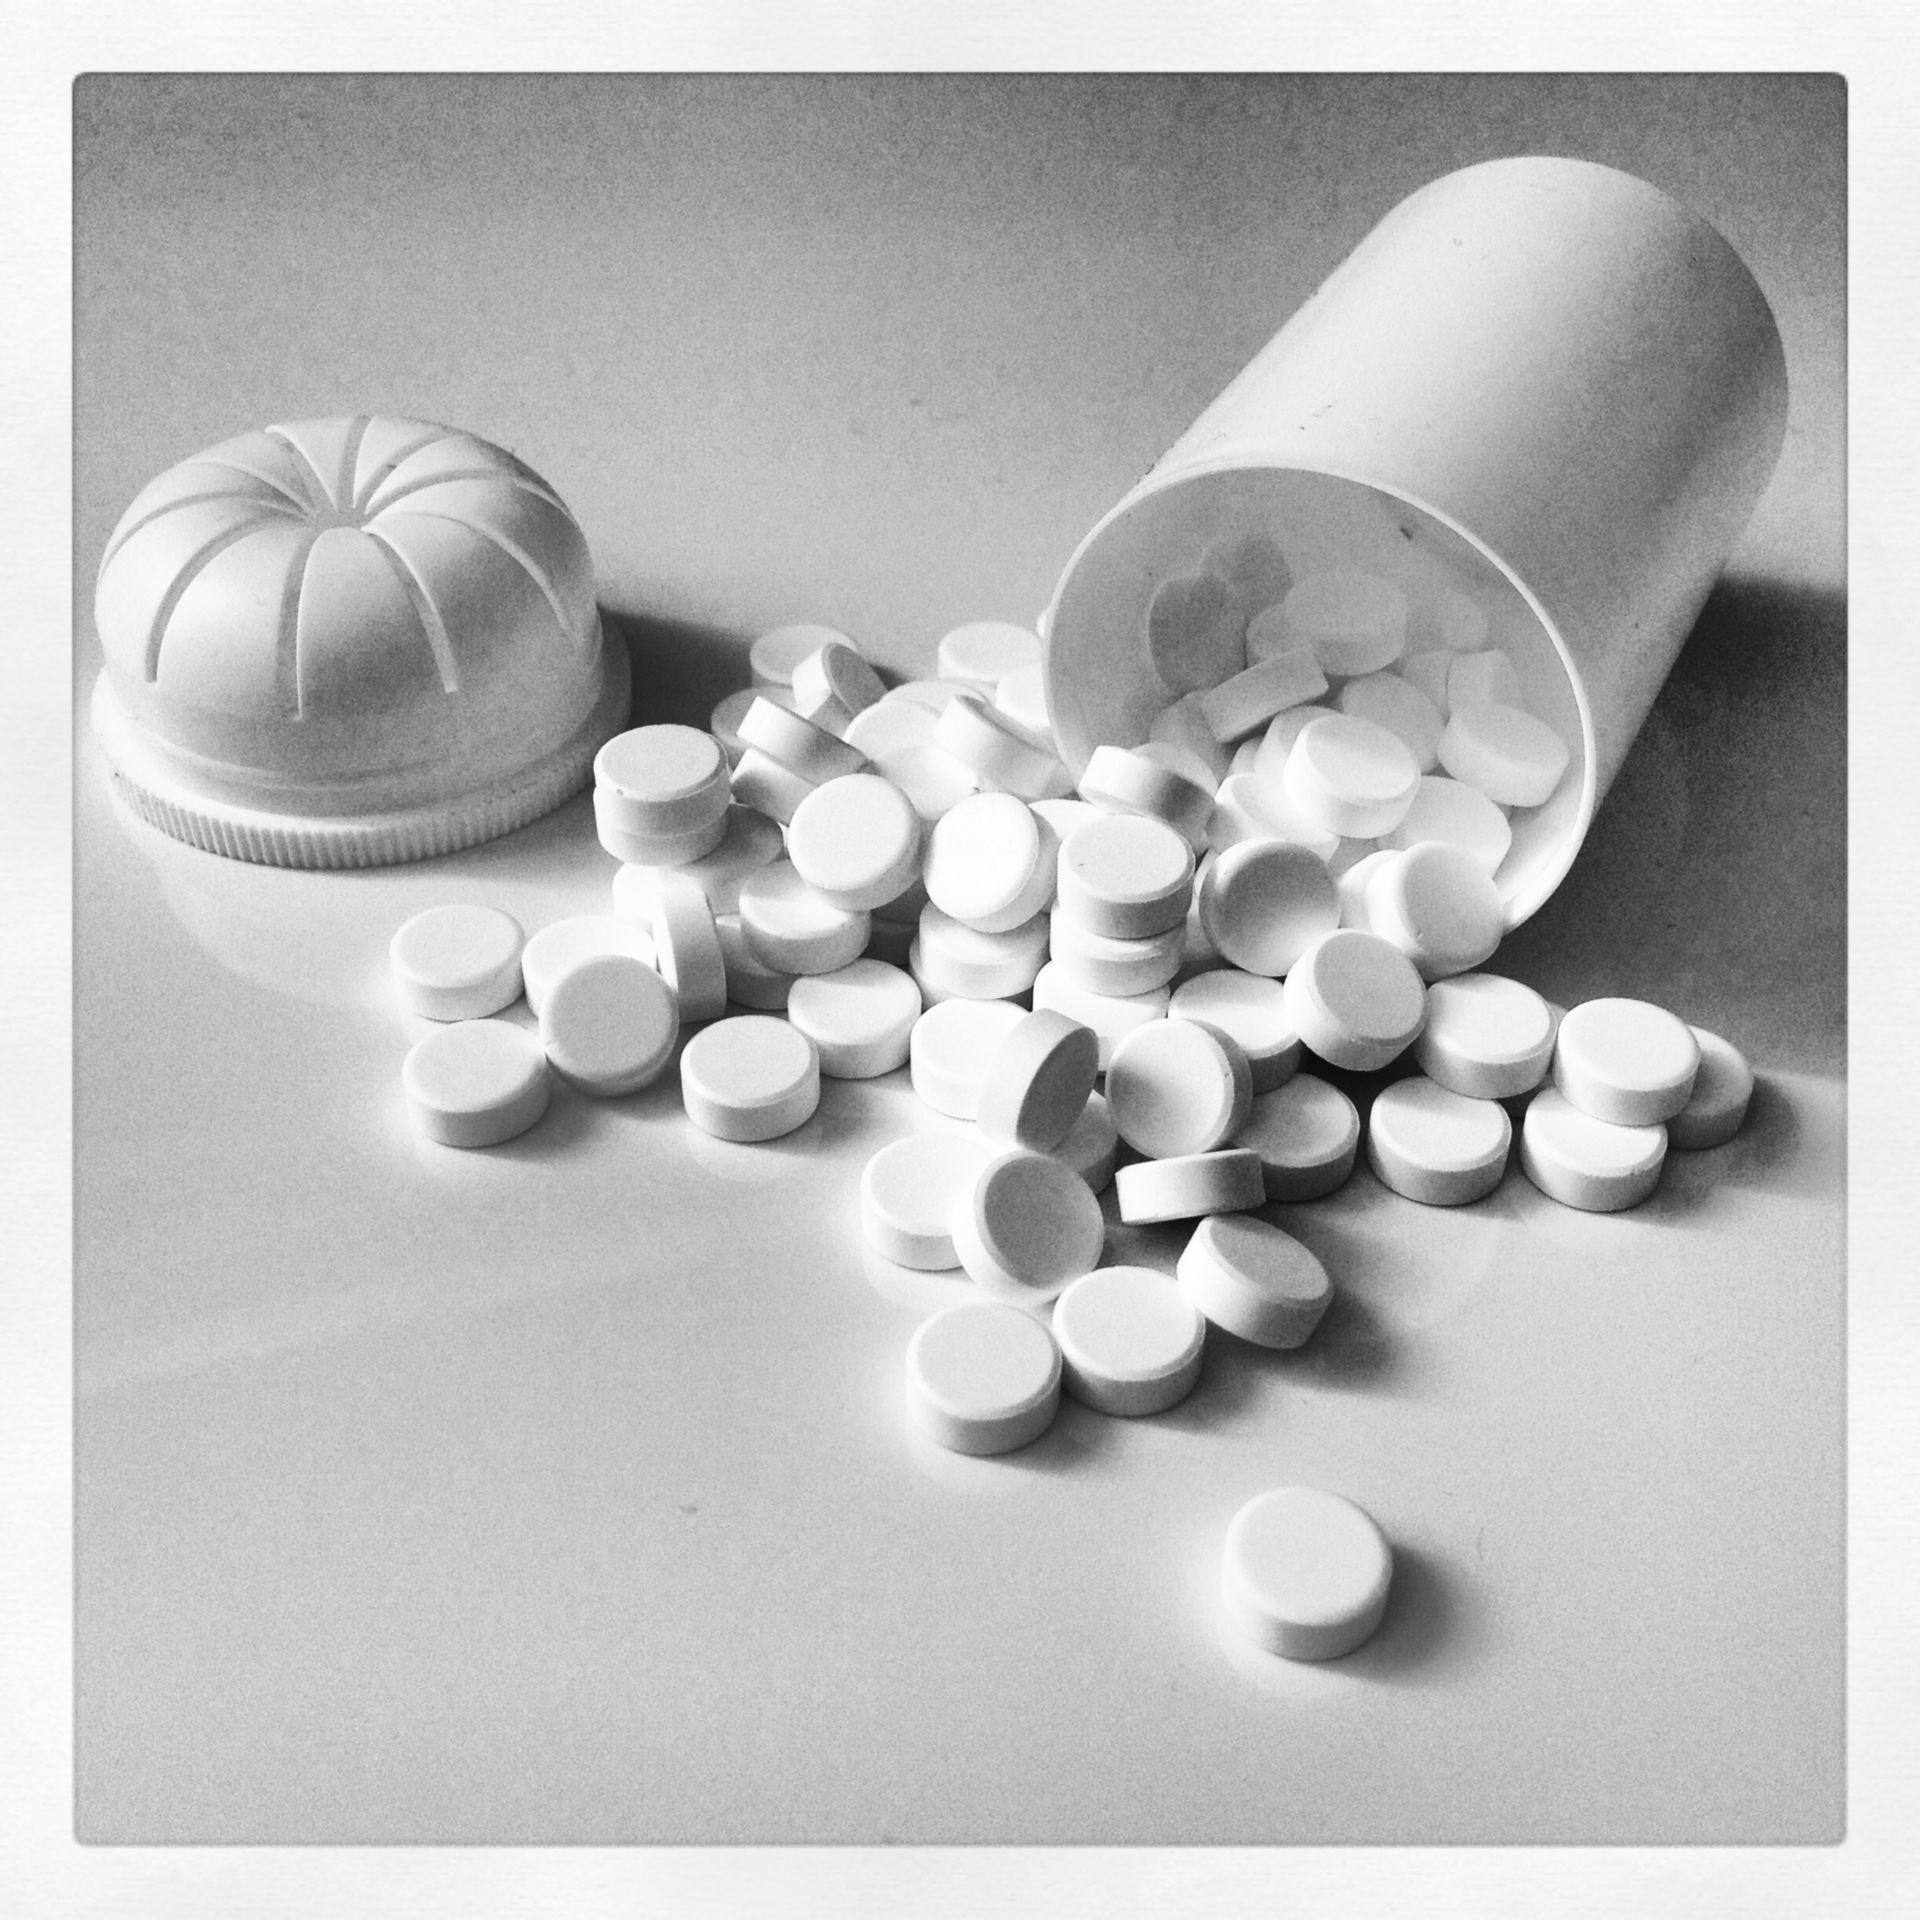 Pills in front of pill bottle